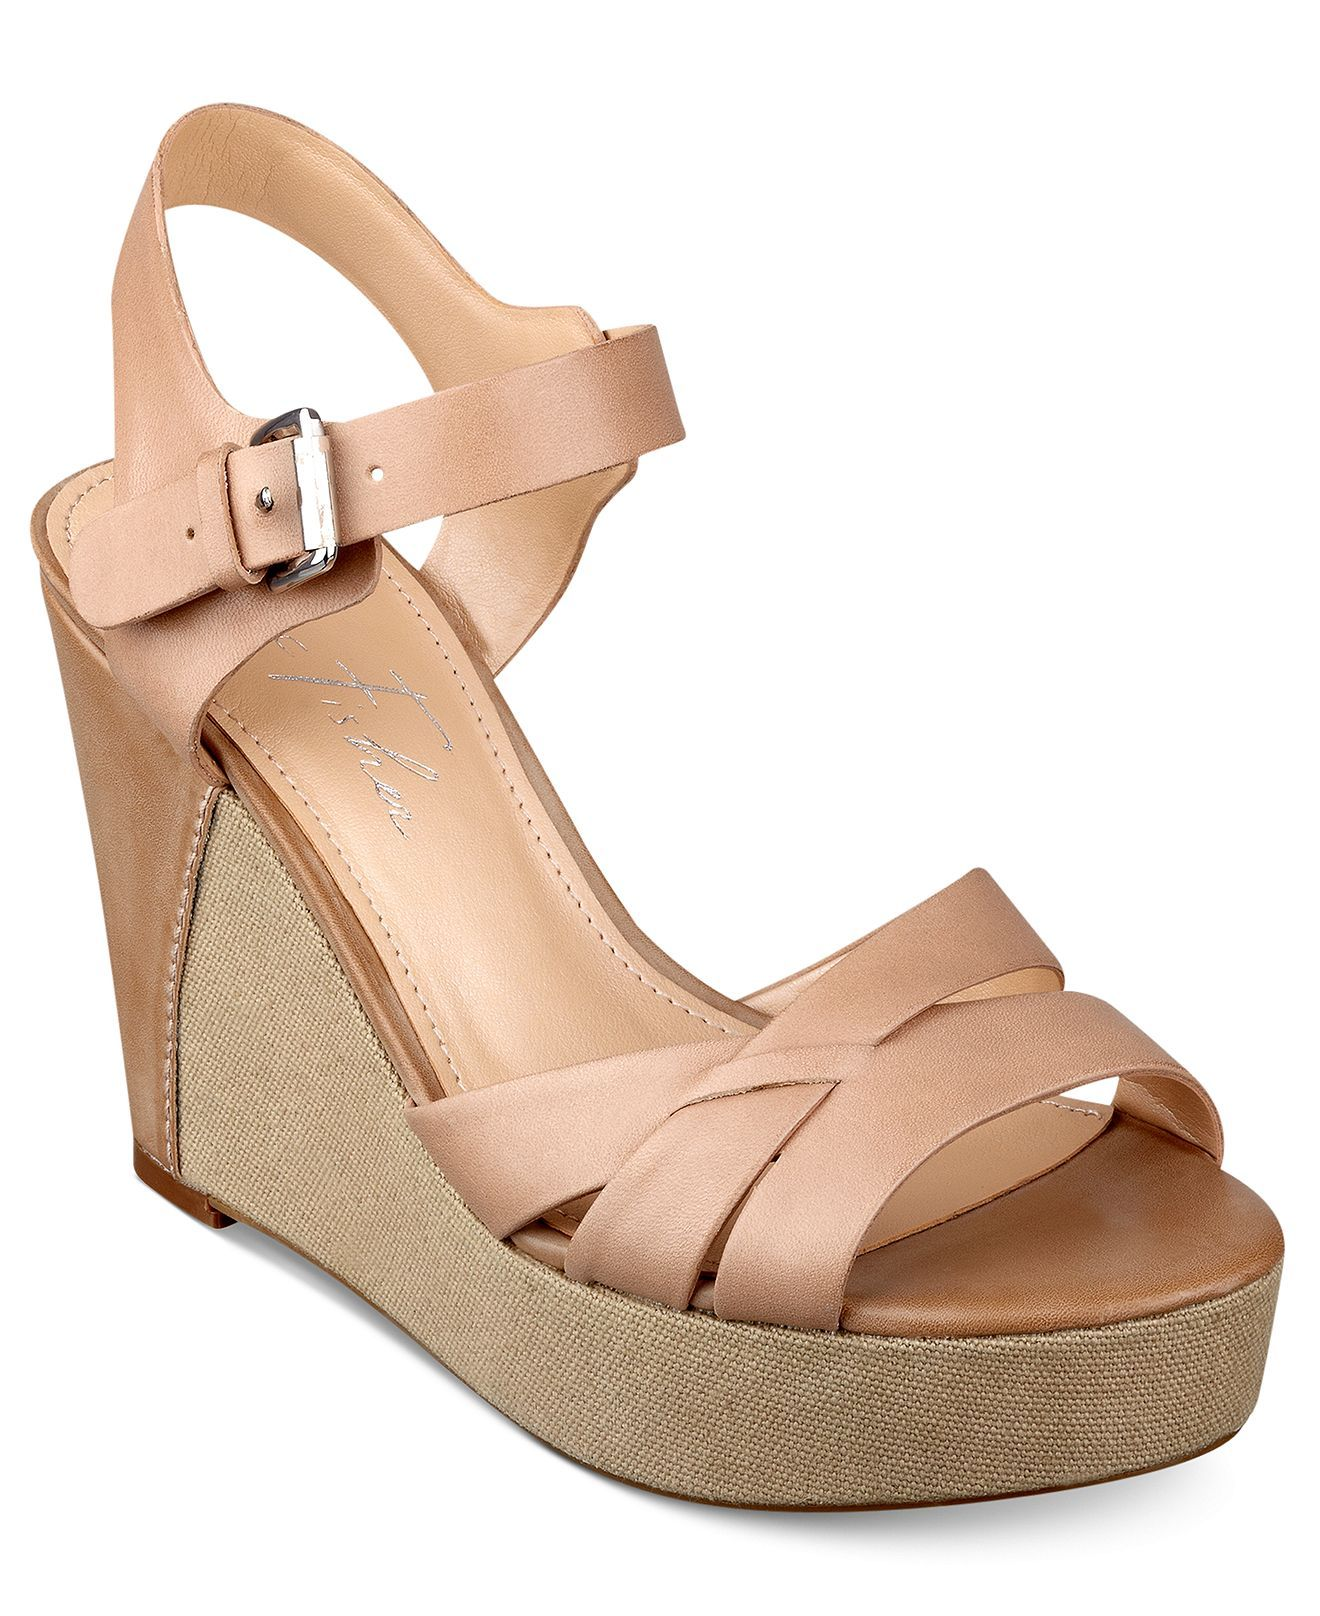 c3f5e24f917 Marc Fisher Shoes, Hello Platform Wedge Sandals - Espadrilles ...